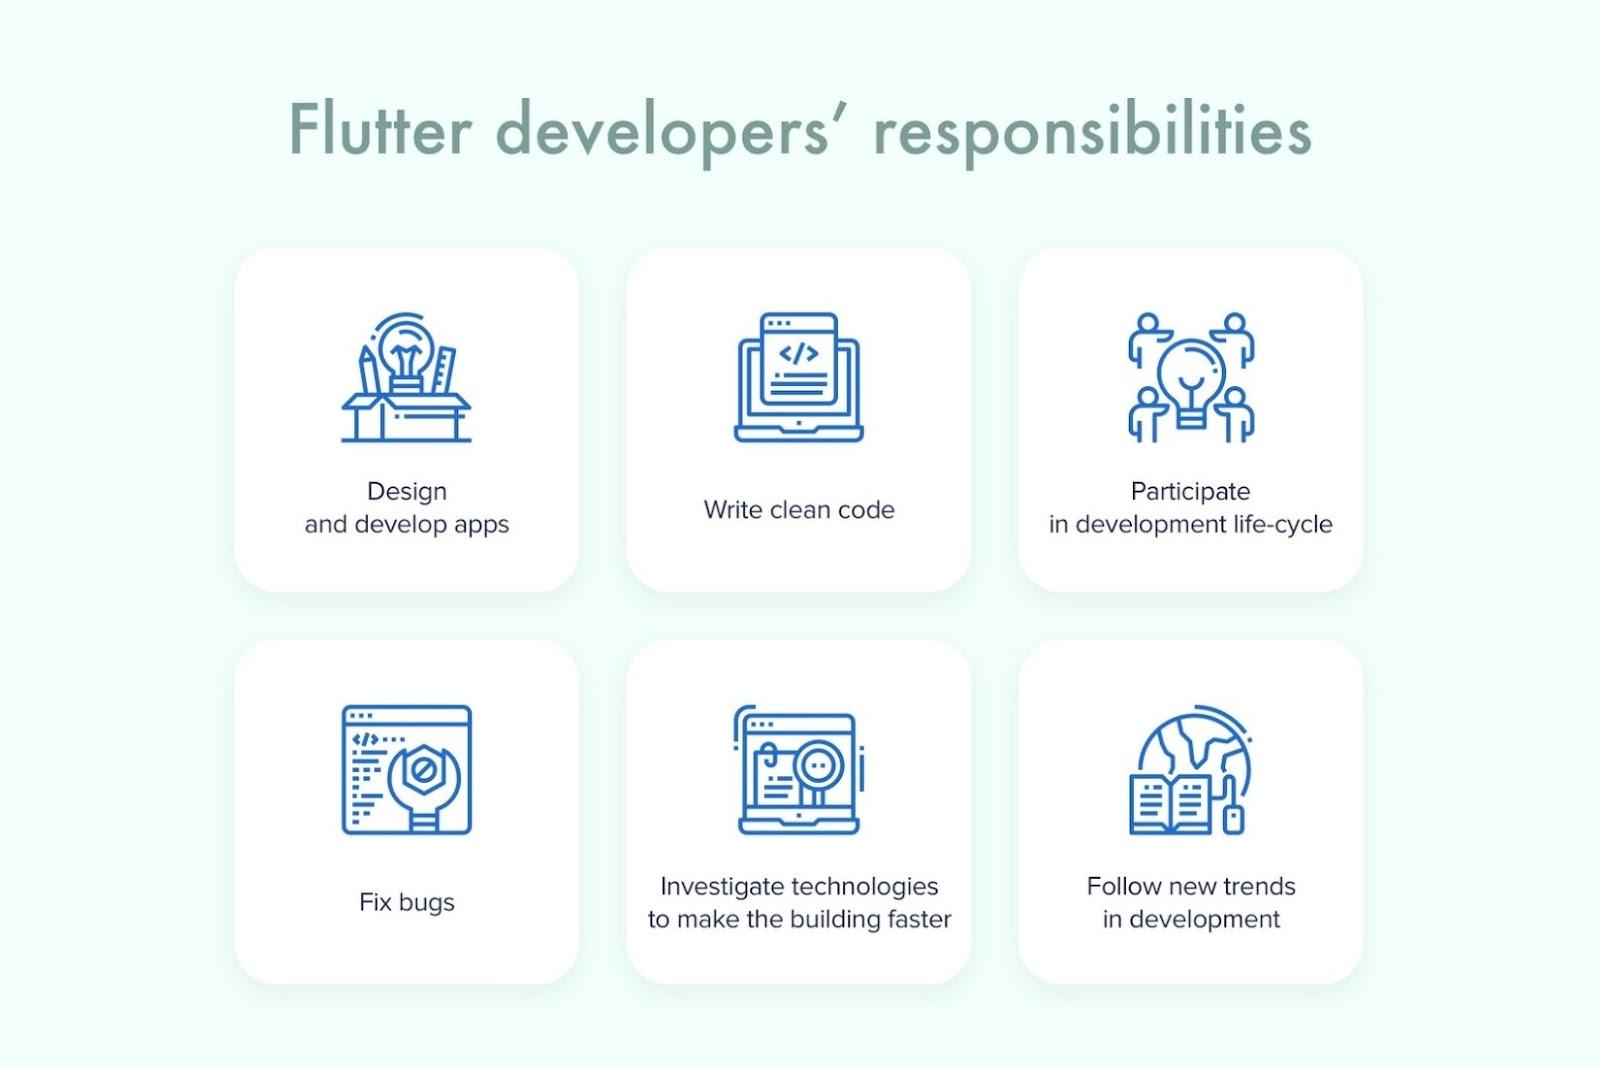 Responsibilities of flutter developers